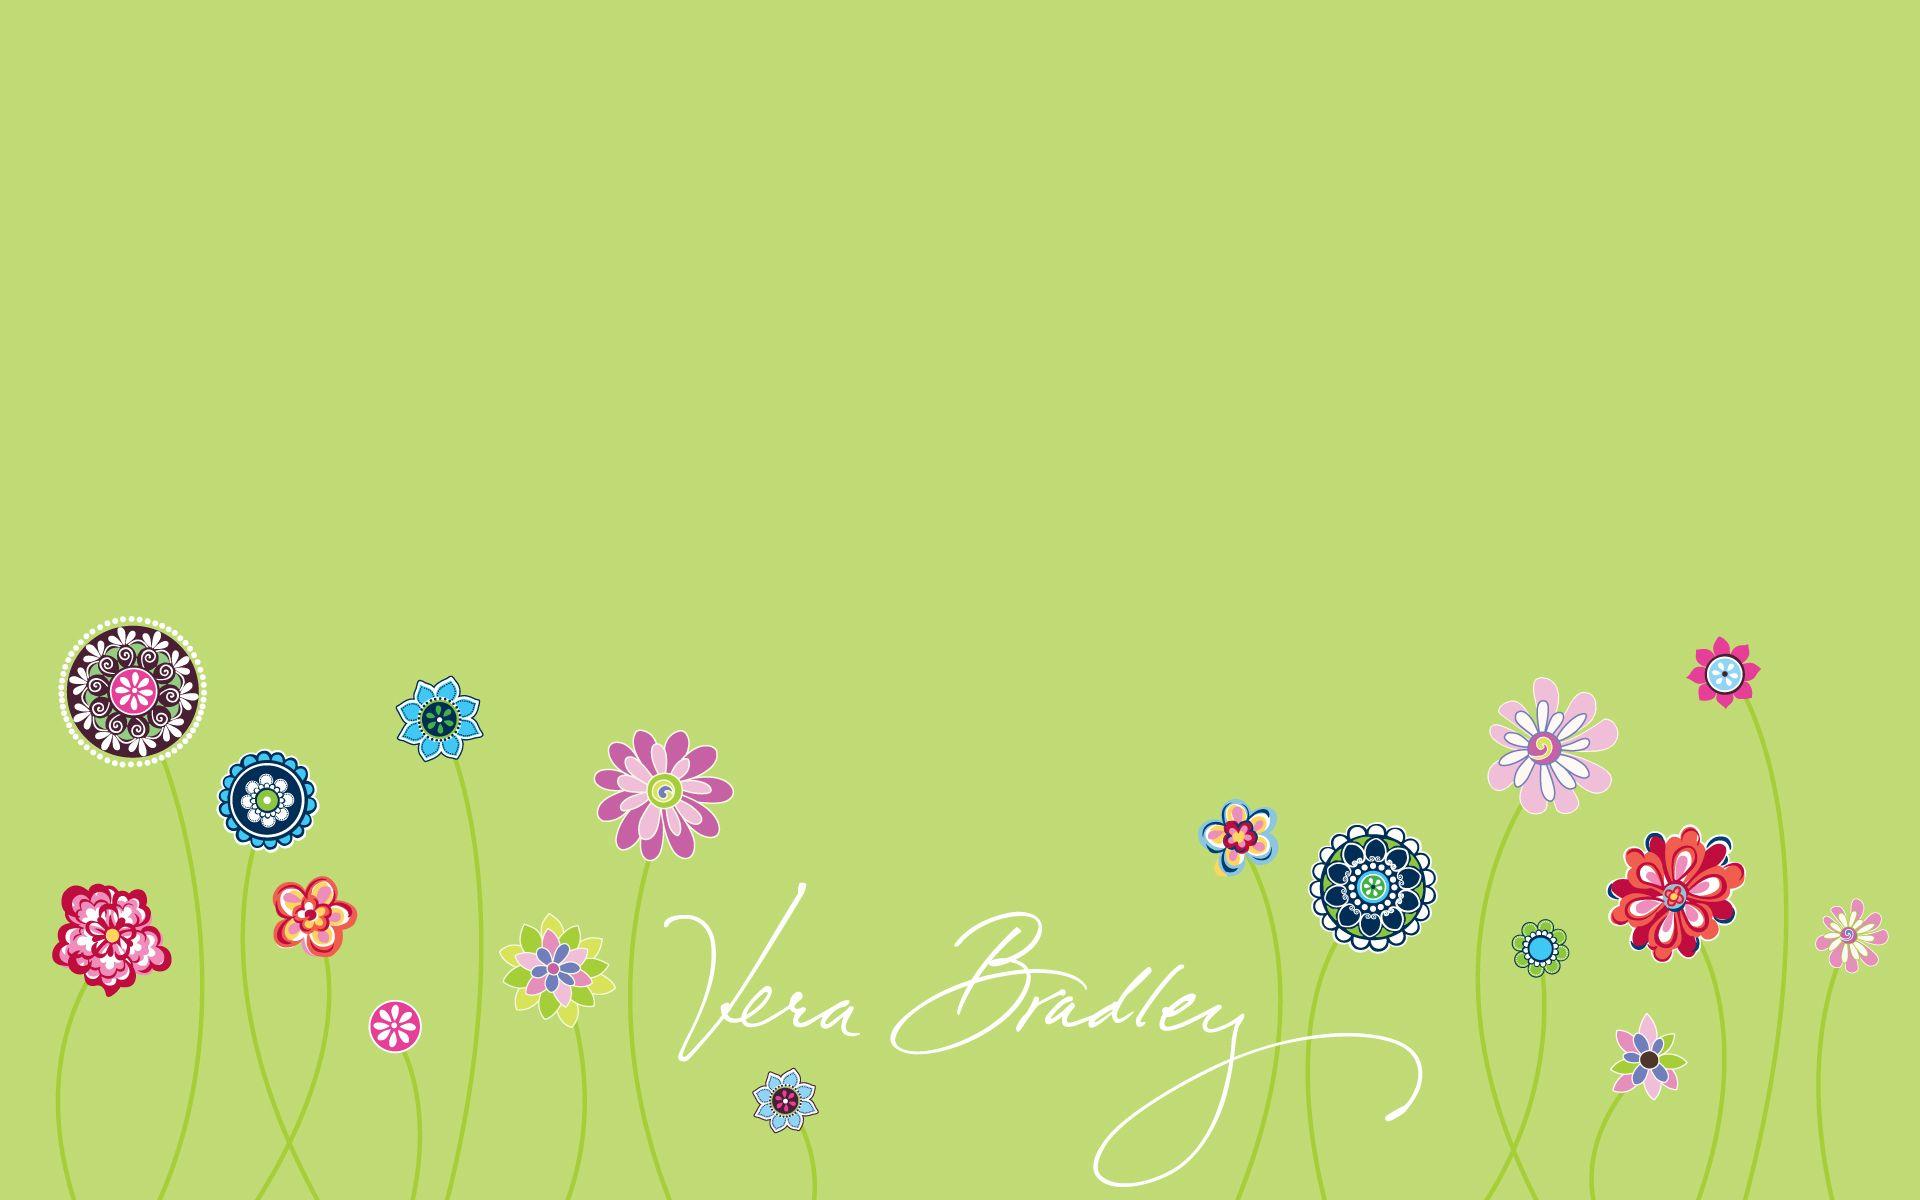 Spring 2009 Spring 2009 Vera Bradley Wallpaper